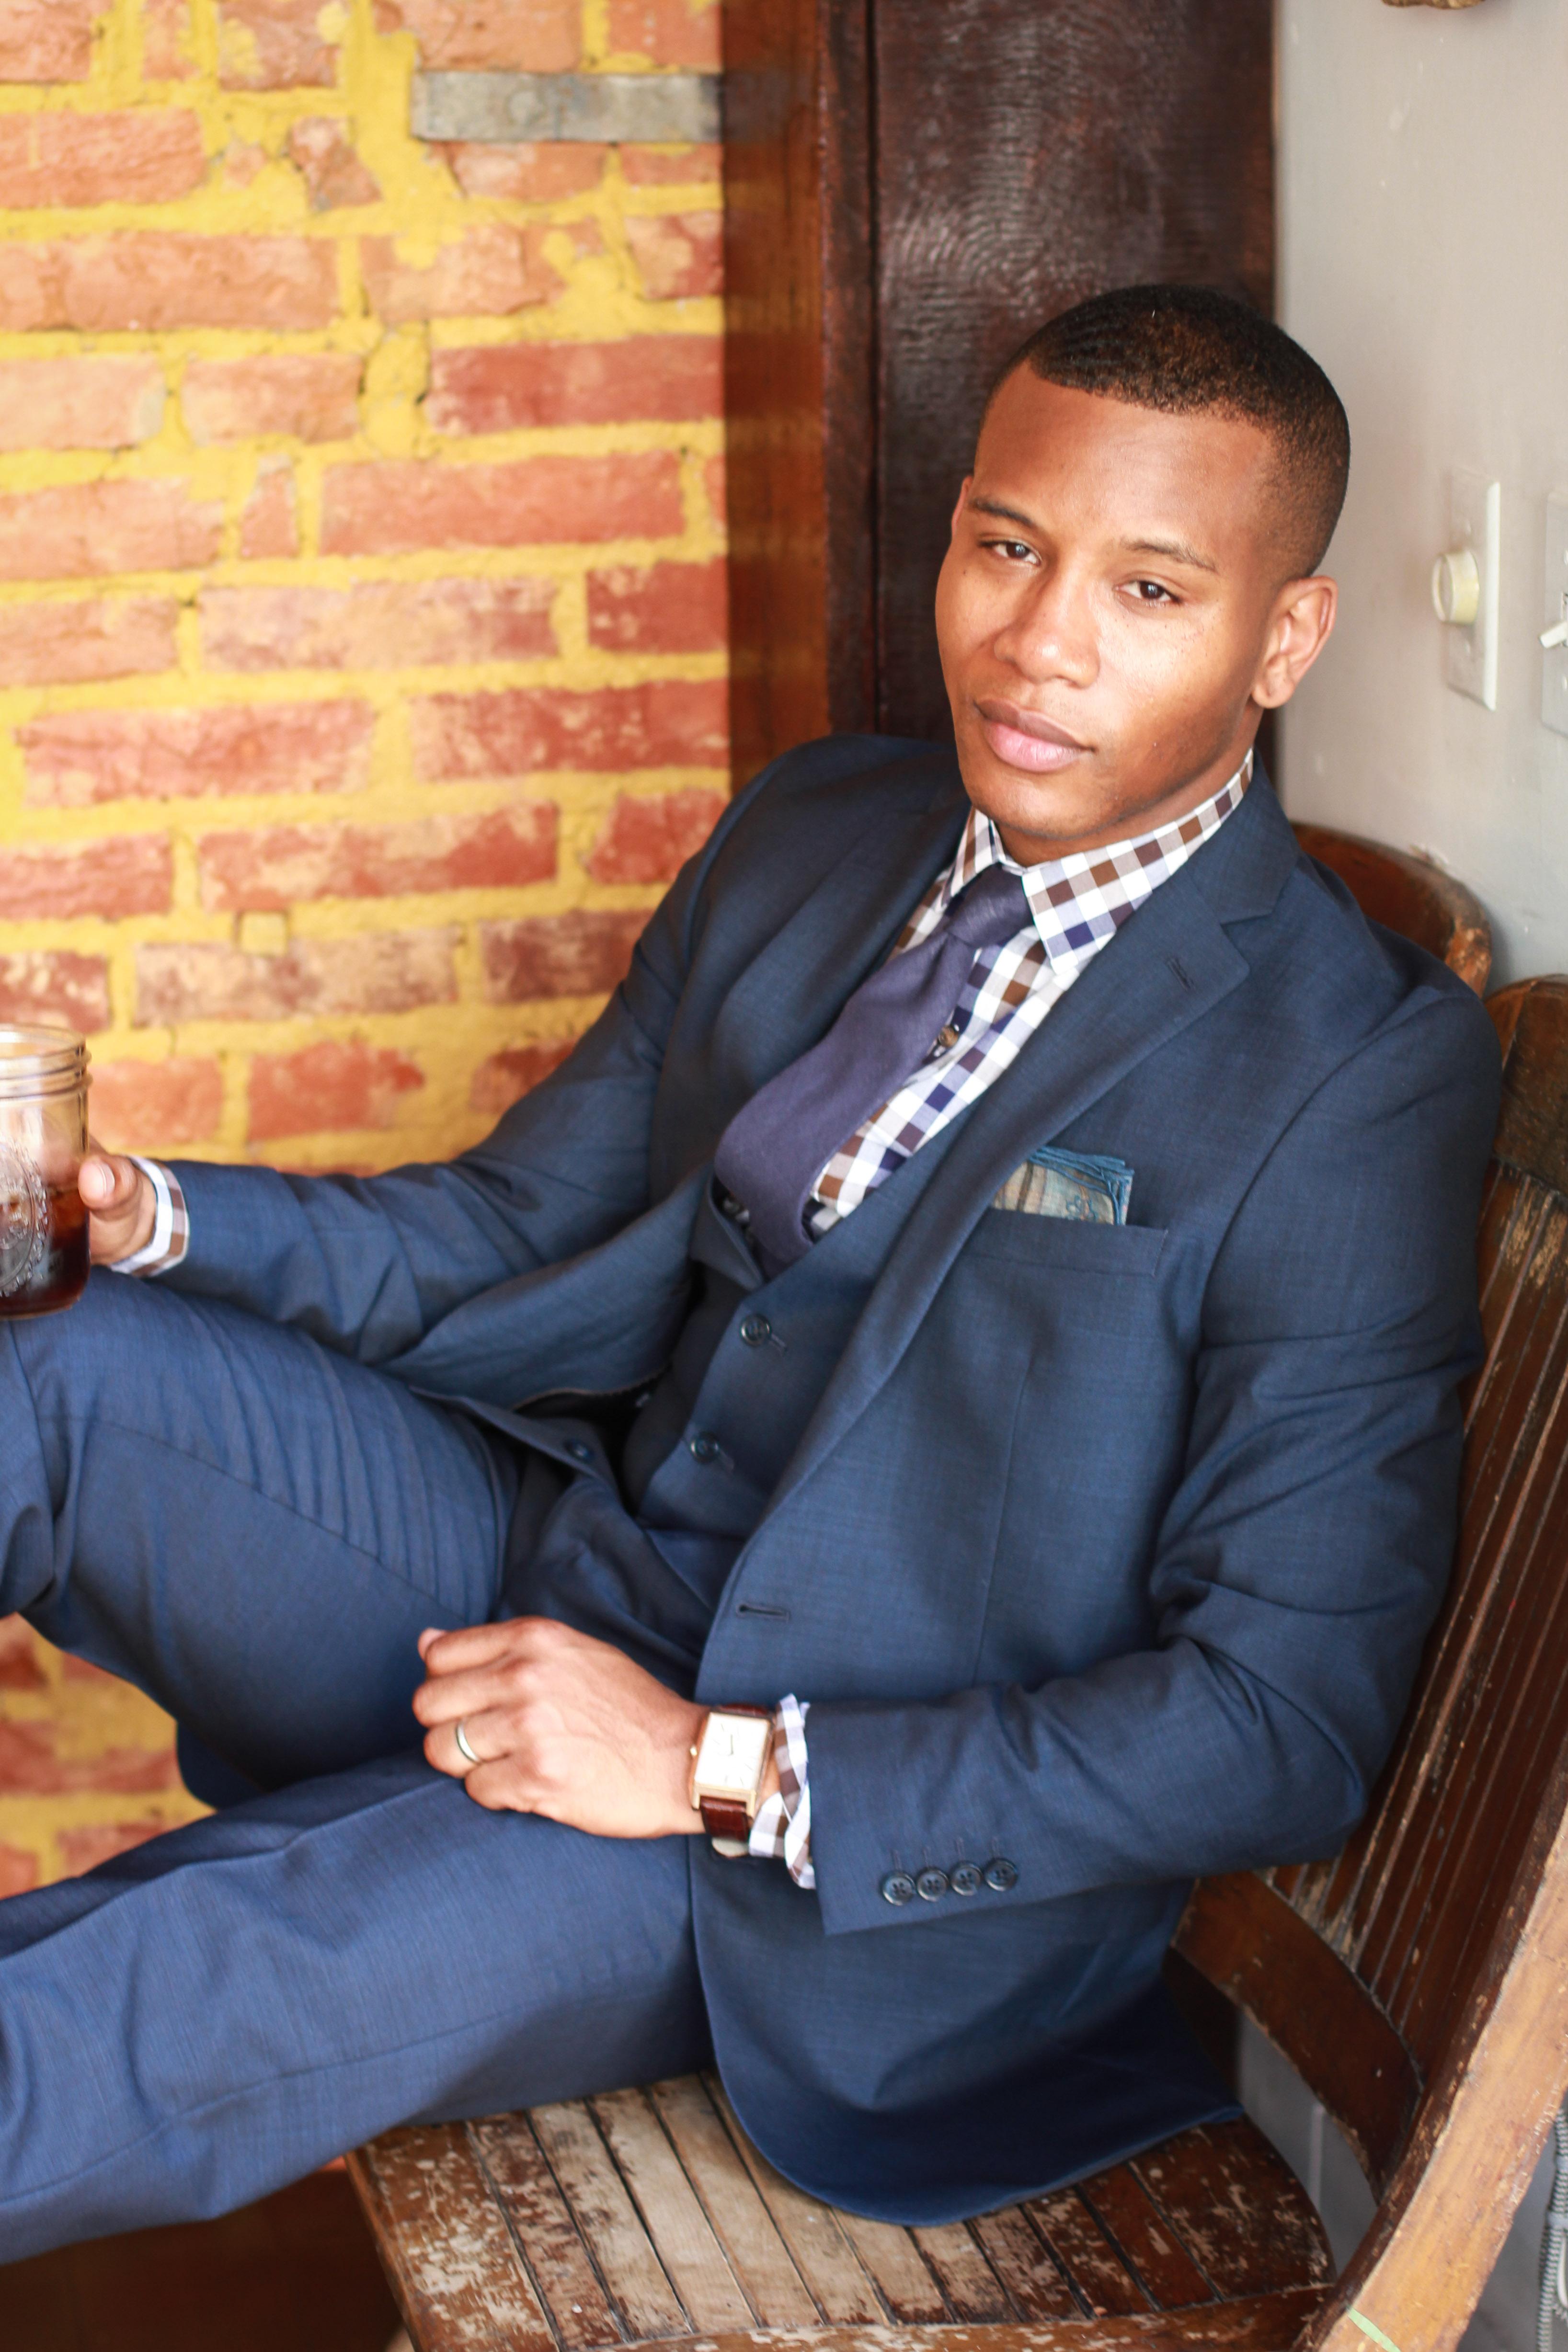 Sabir M. Peele of Men's Style Pro in Bar III Midnight Blue Suit For Macy's #Sponsored